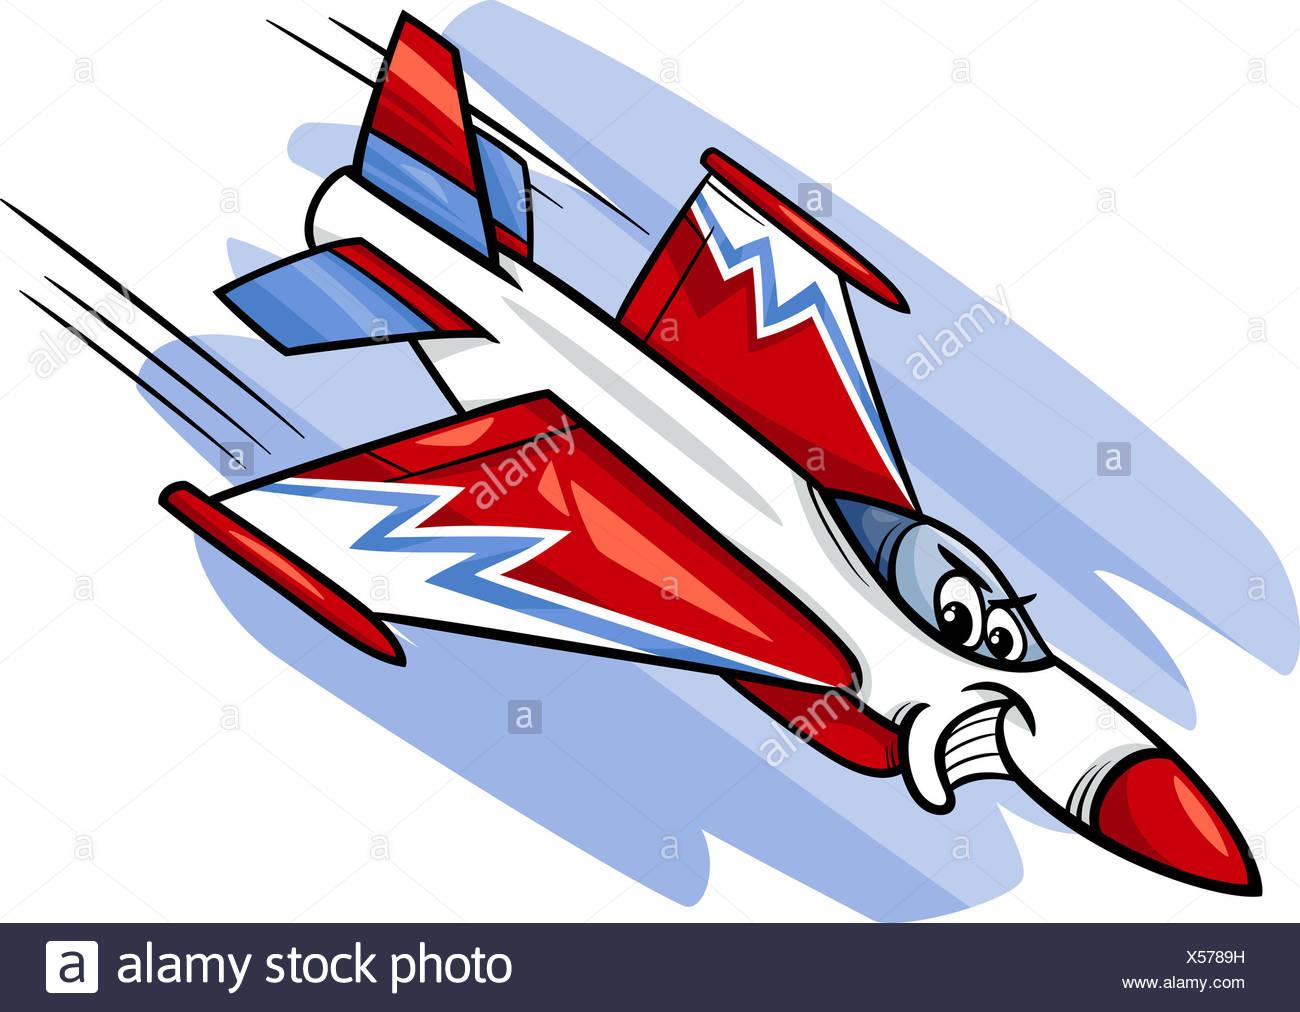 jet fighter plane cartoon illustration - Stock Image